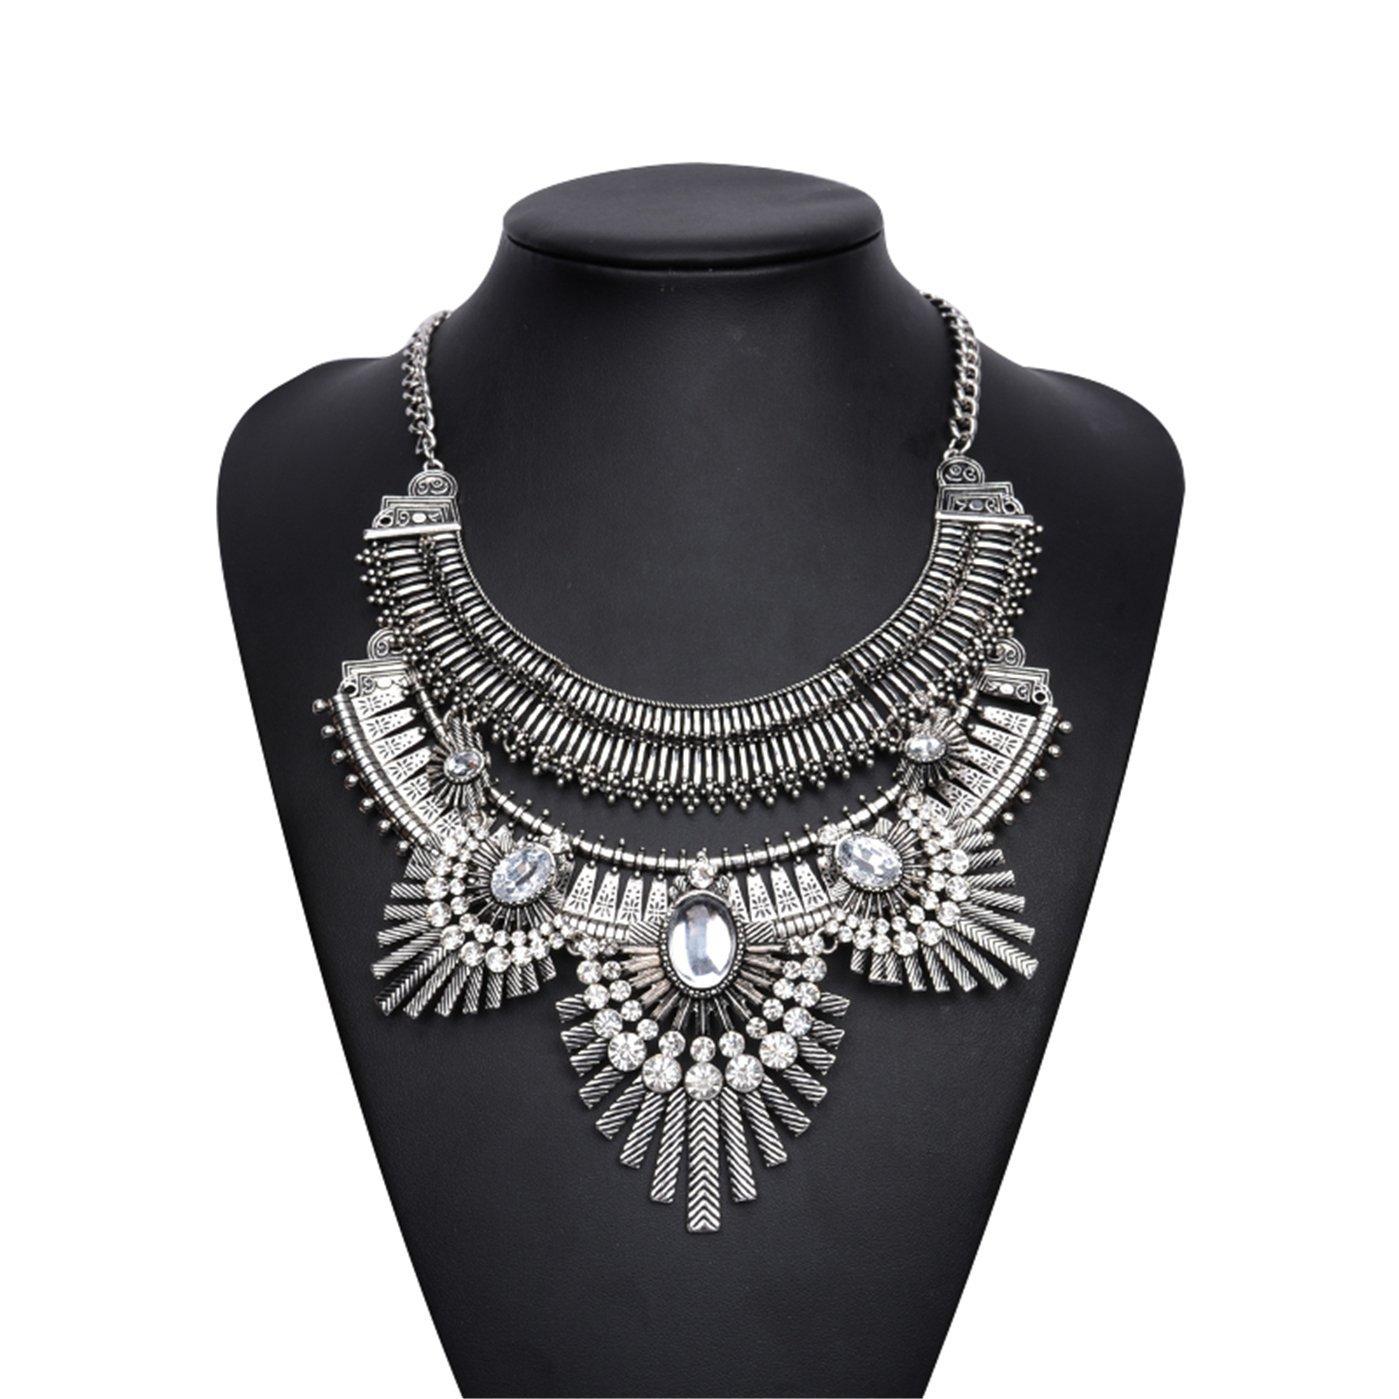 Lanue Vintage Gypsy Bohemian Ethnic Tribal Boho Statement Pendant Necklace,Owl style (Silver)